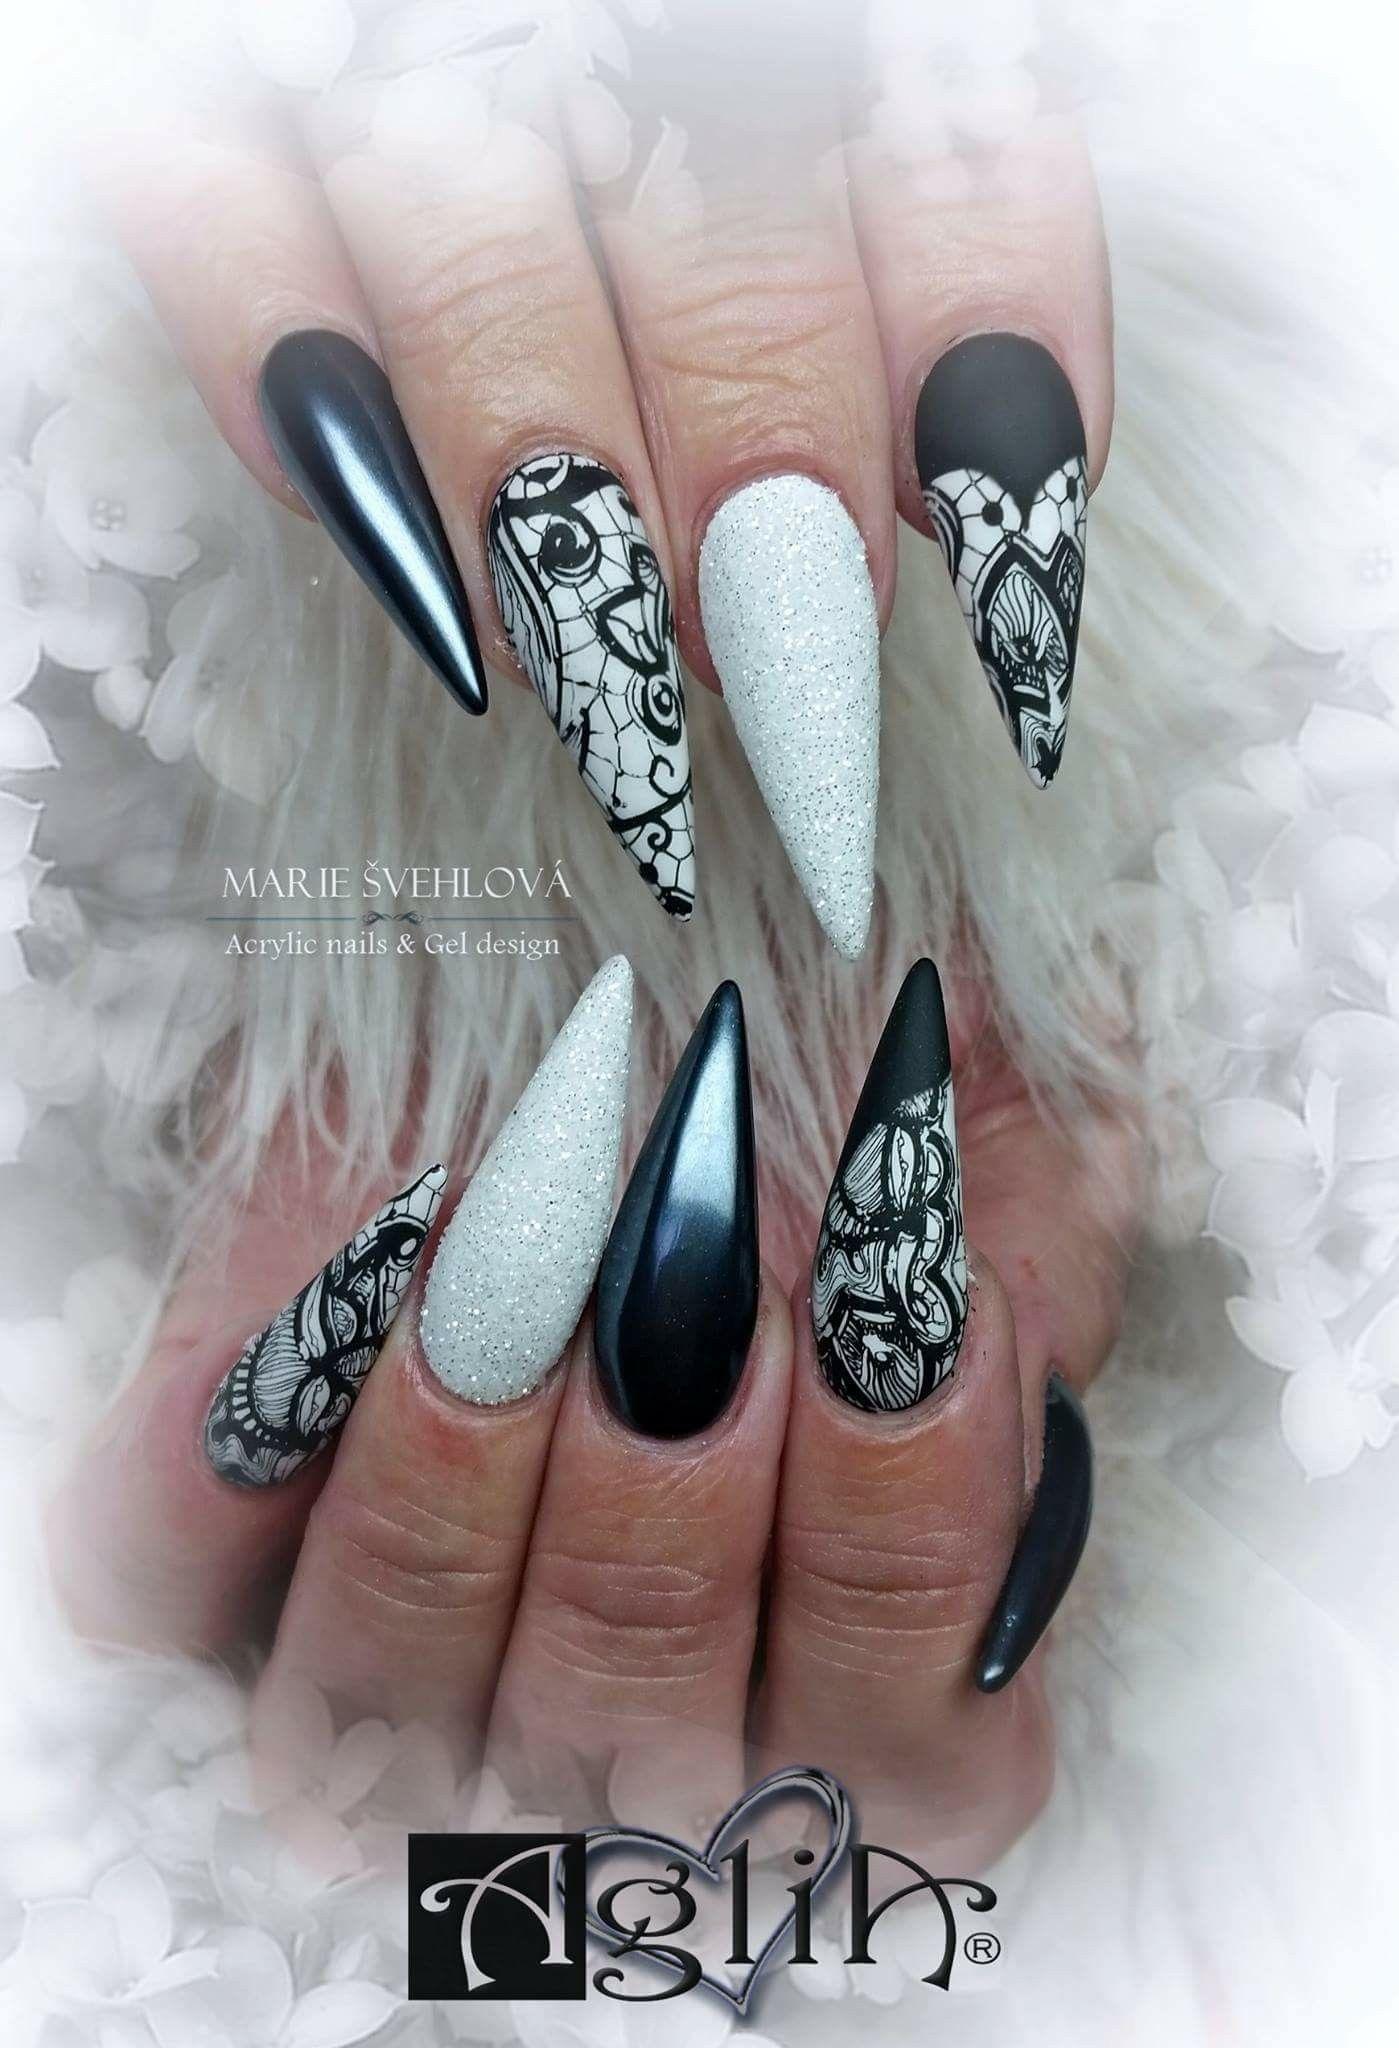 Pin Von Maria Andonova Auf Nails Nail Art Nail Art Designs Und Nails